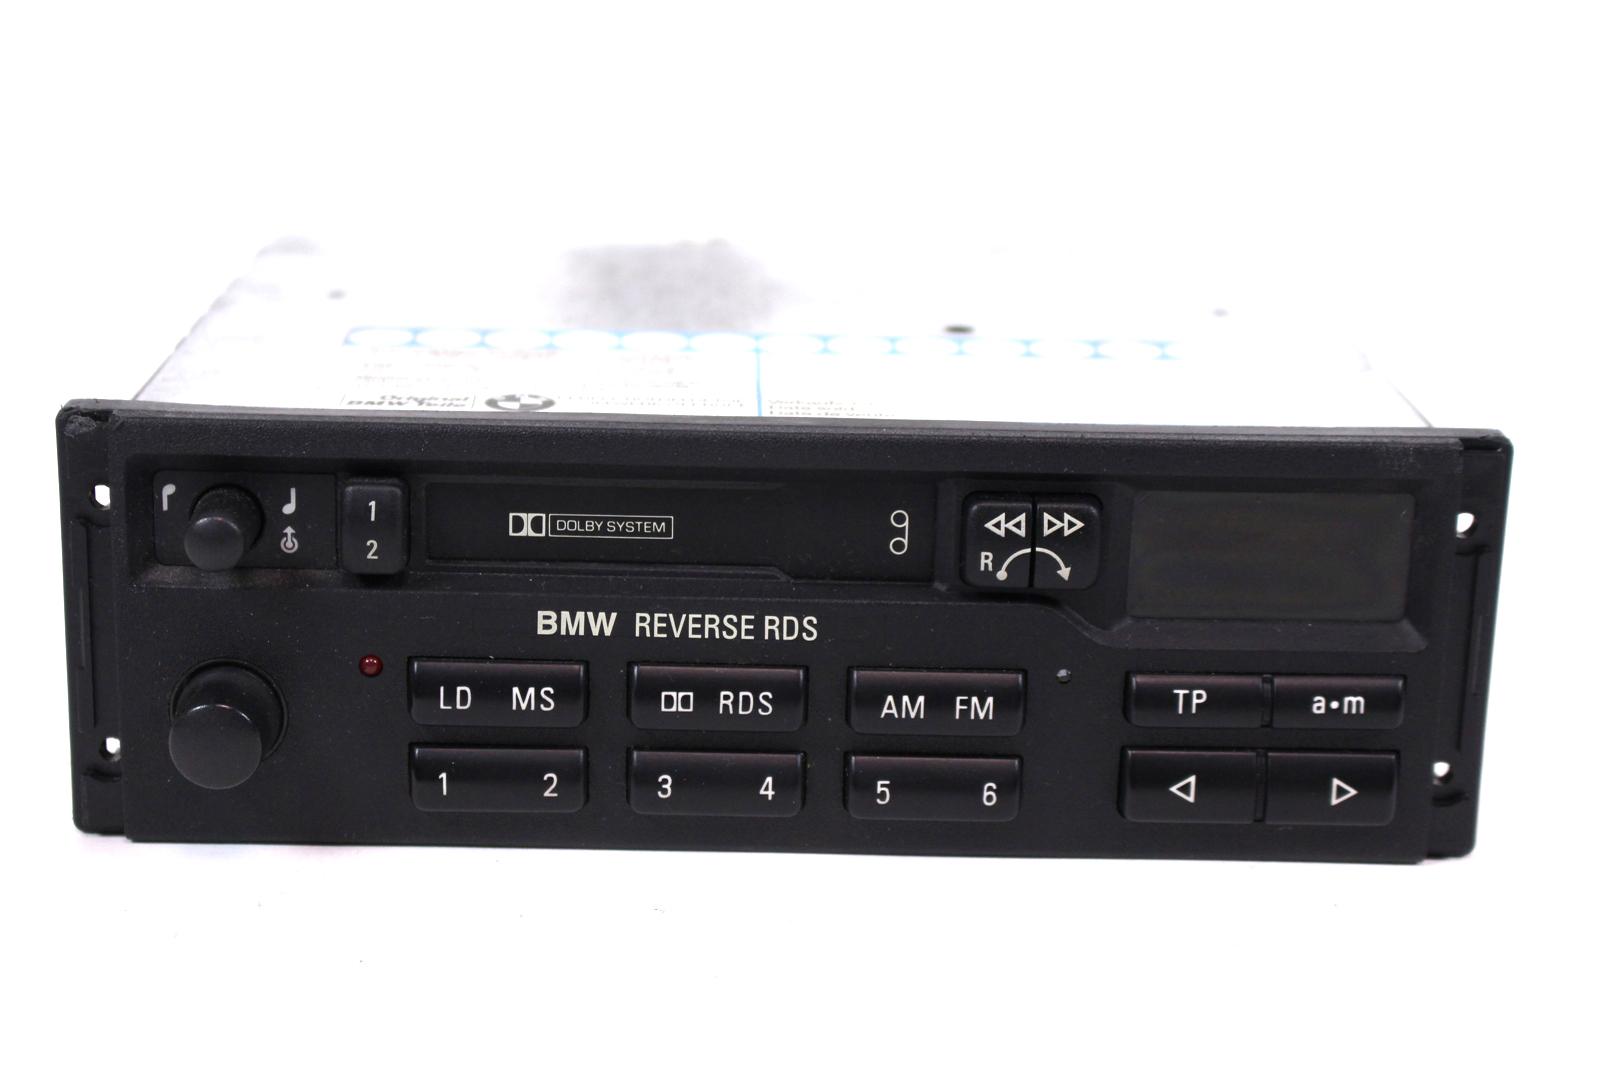 Bmw Reverse Rds Code Berechnen : autoradio blaupunkt mc kassette bmw reverse rds 7643836340 ~ Themetempest.com Abrechnung